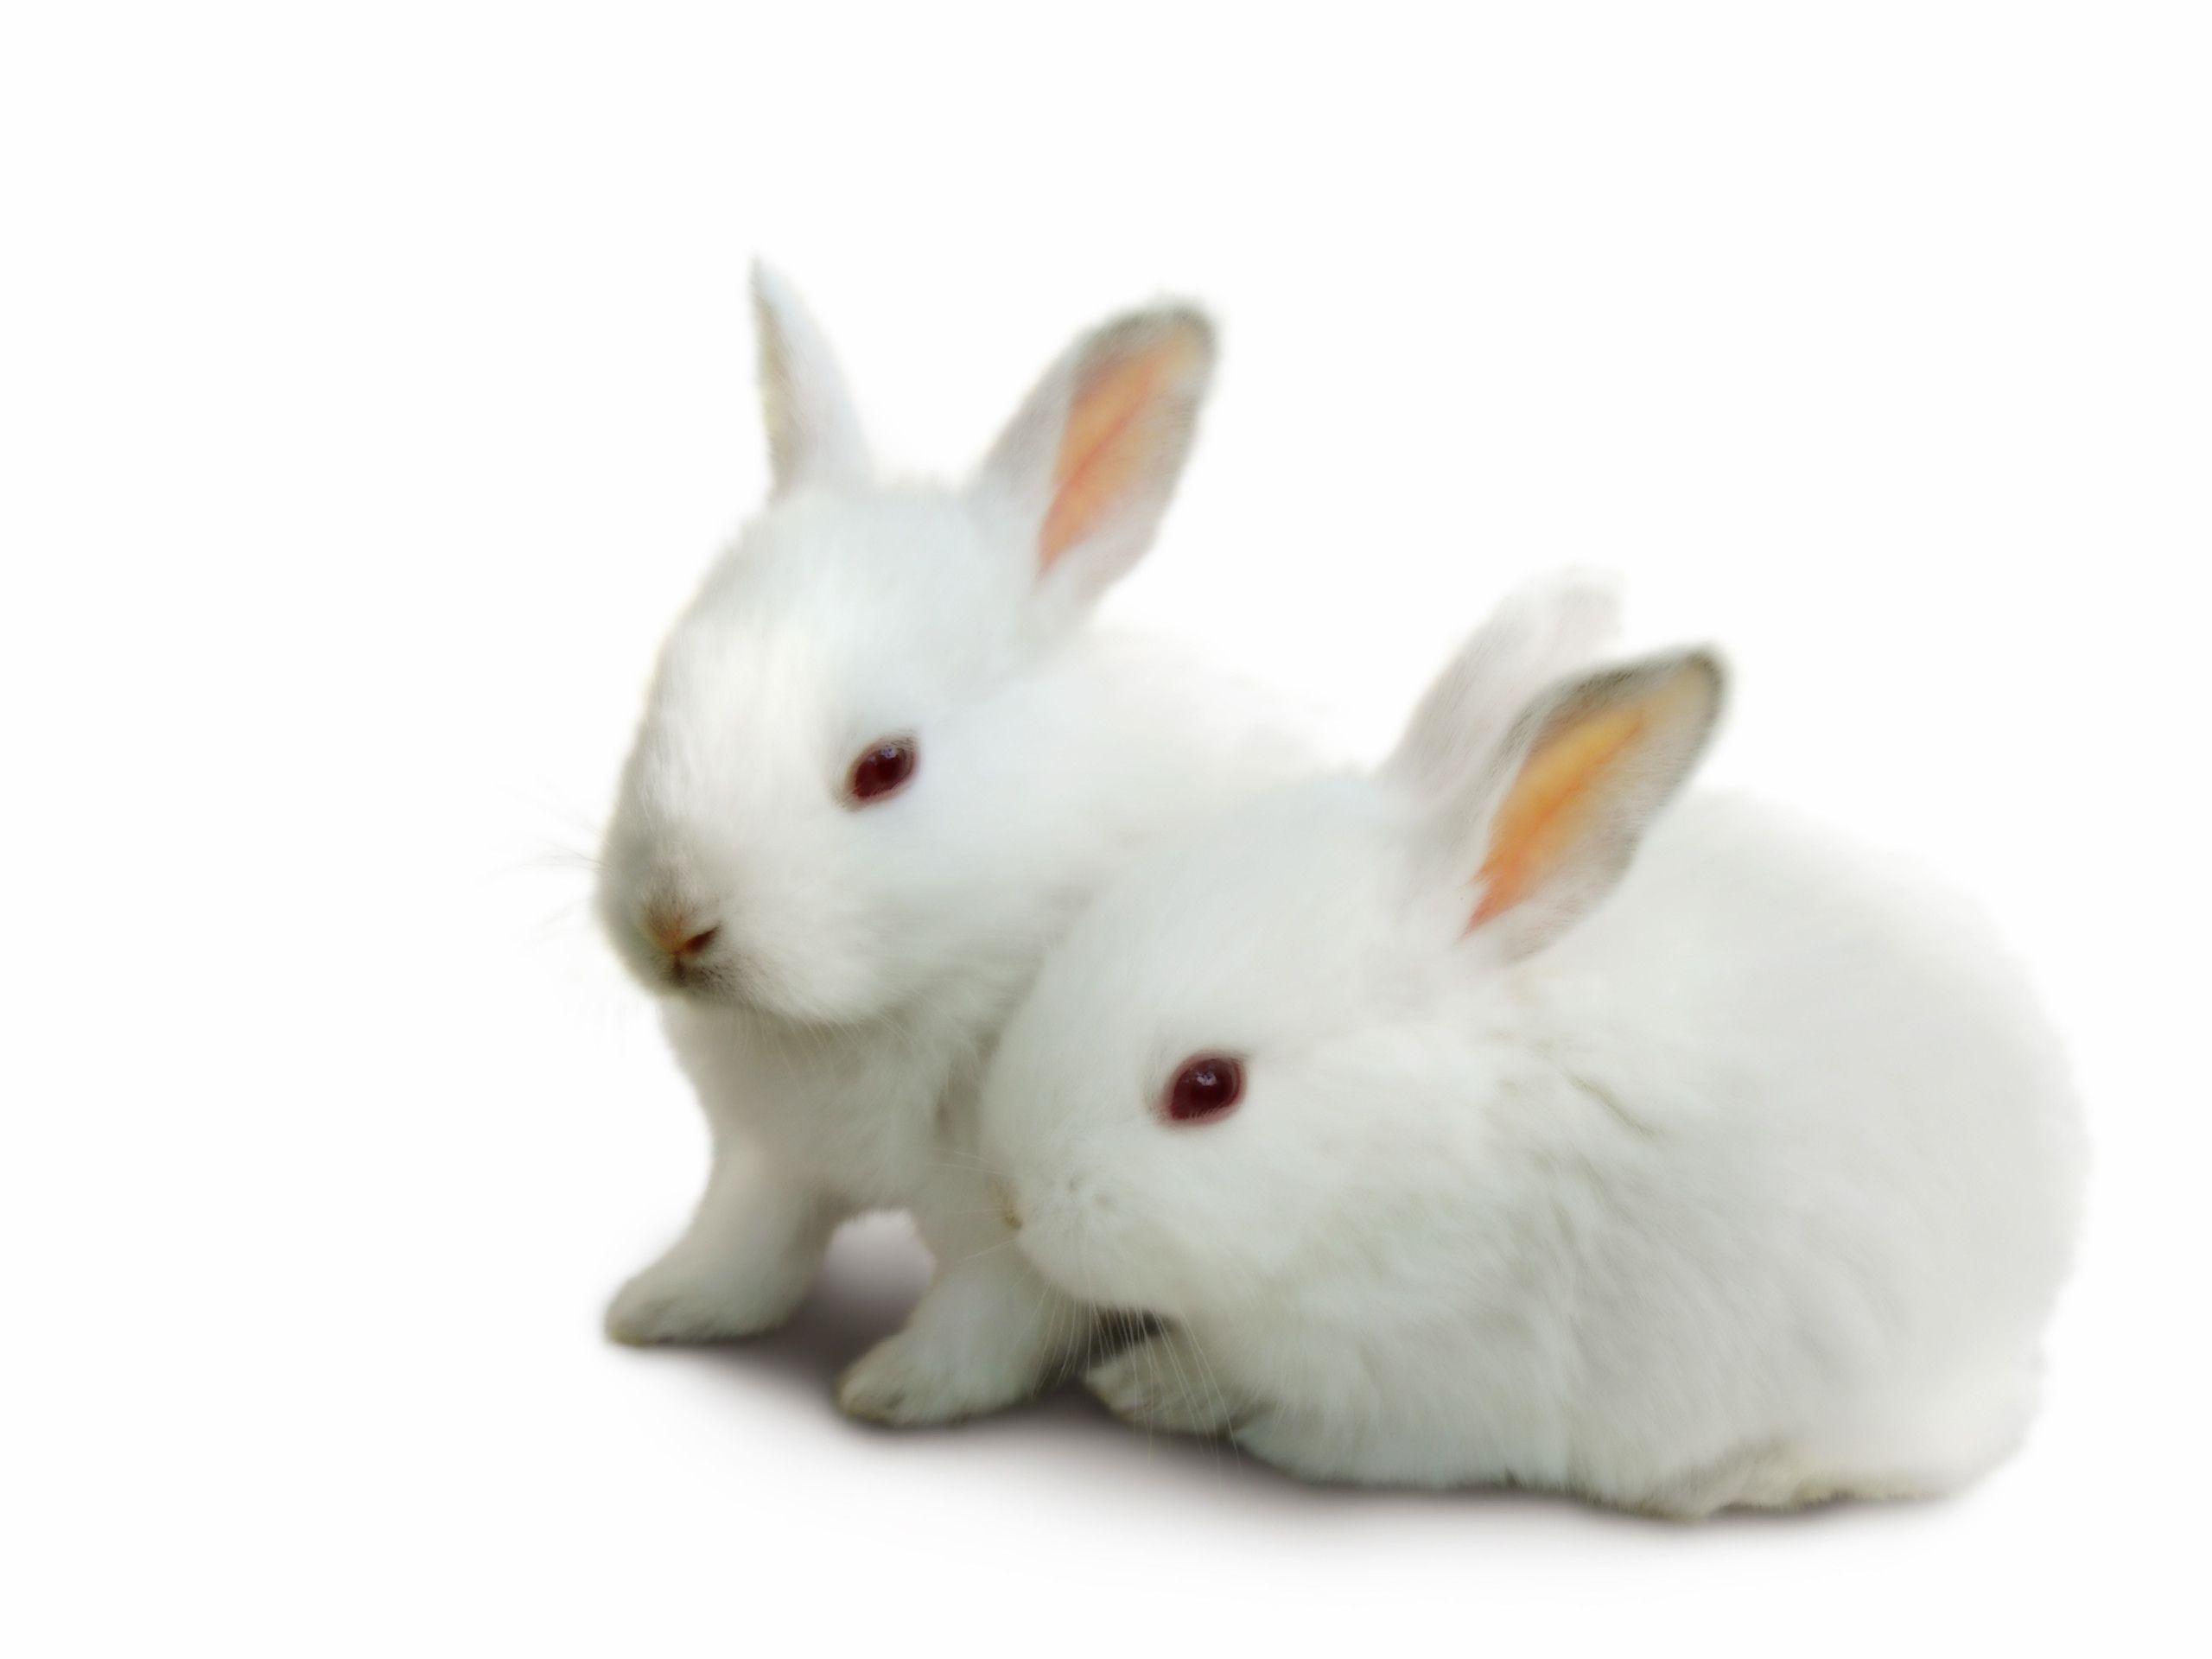 Cute White Rabbit Wallpapers For Desktop: Baby Bunny Wallpaper Desktop